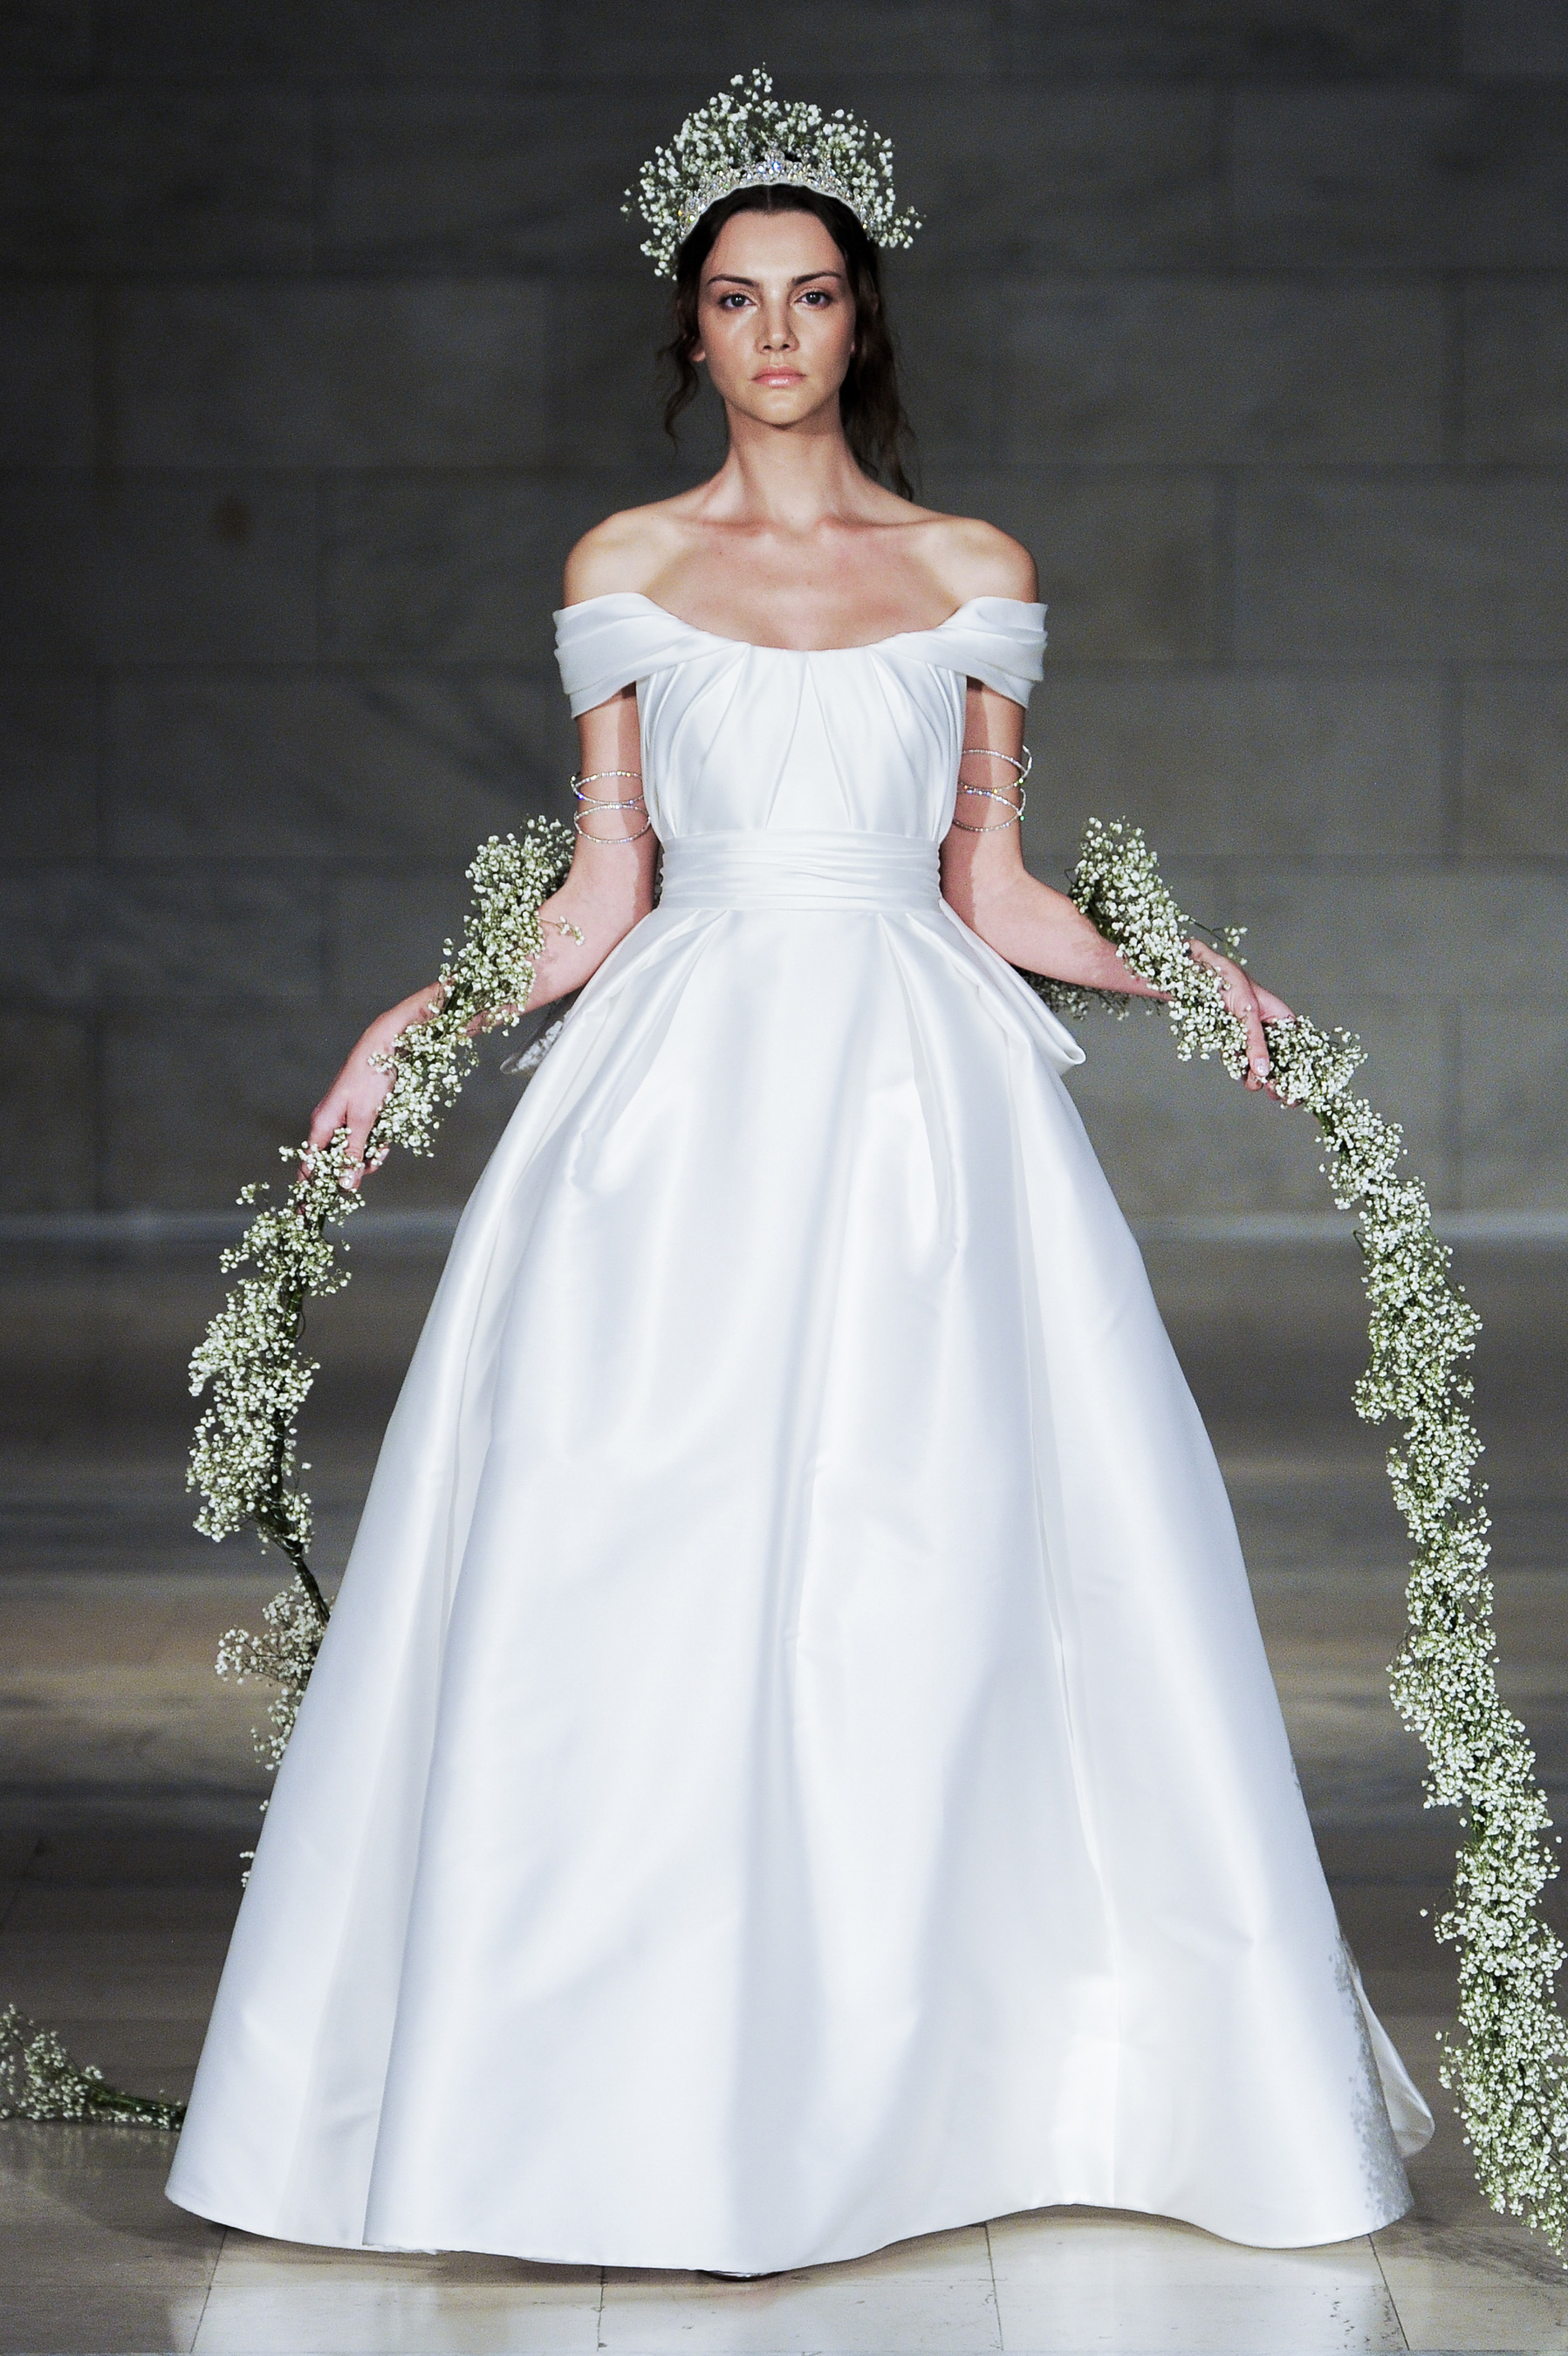 09246c2bb4 suknie ślubne 2018 - Elle.pl - trendy wiosna lato 2019  moda